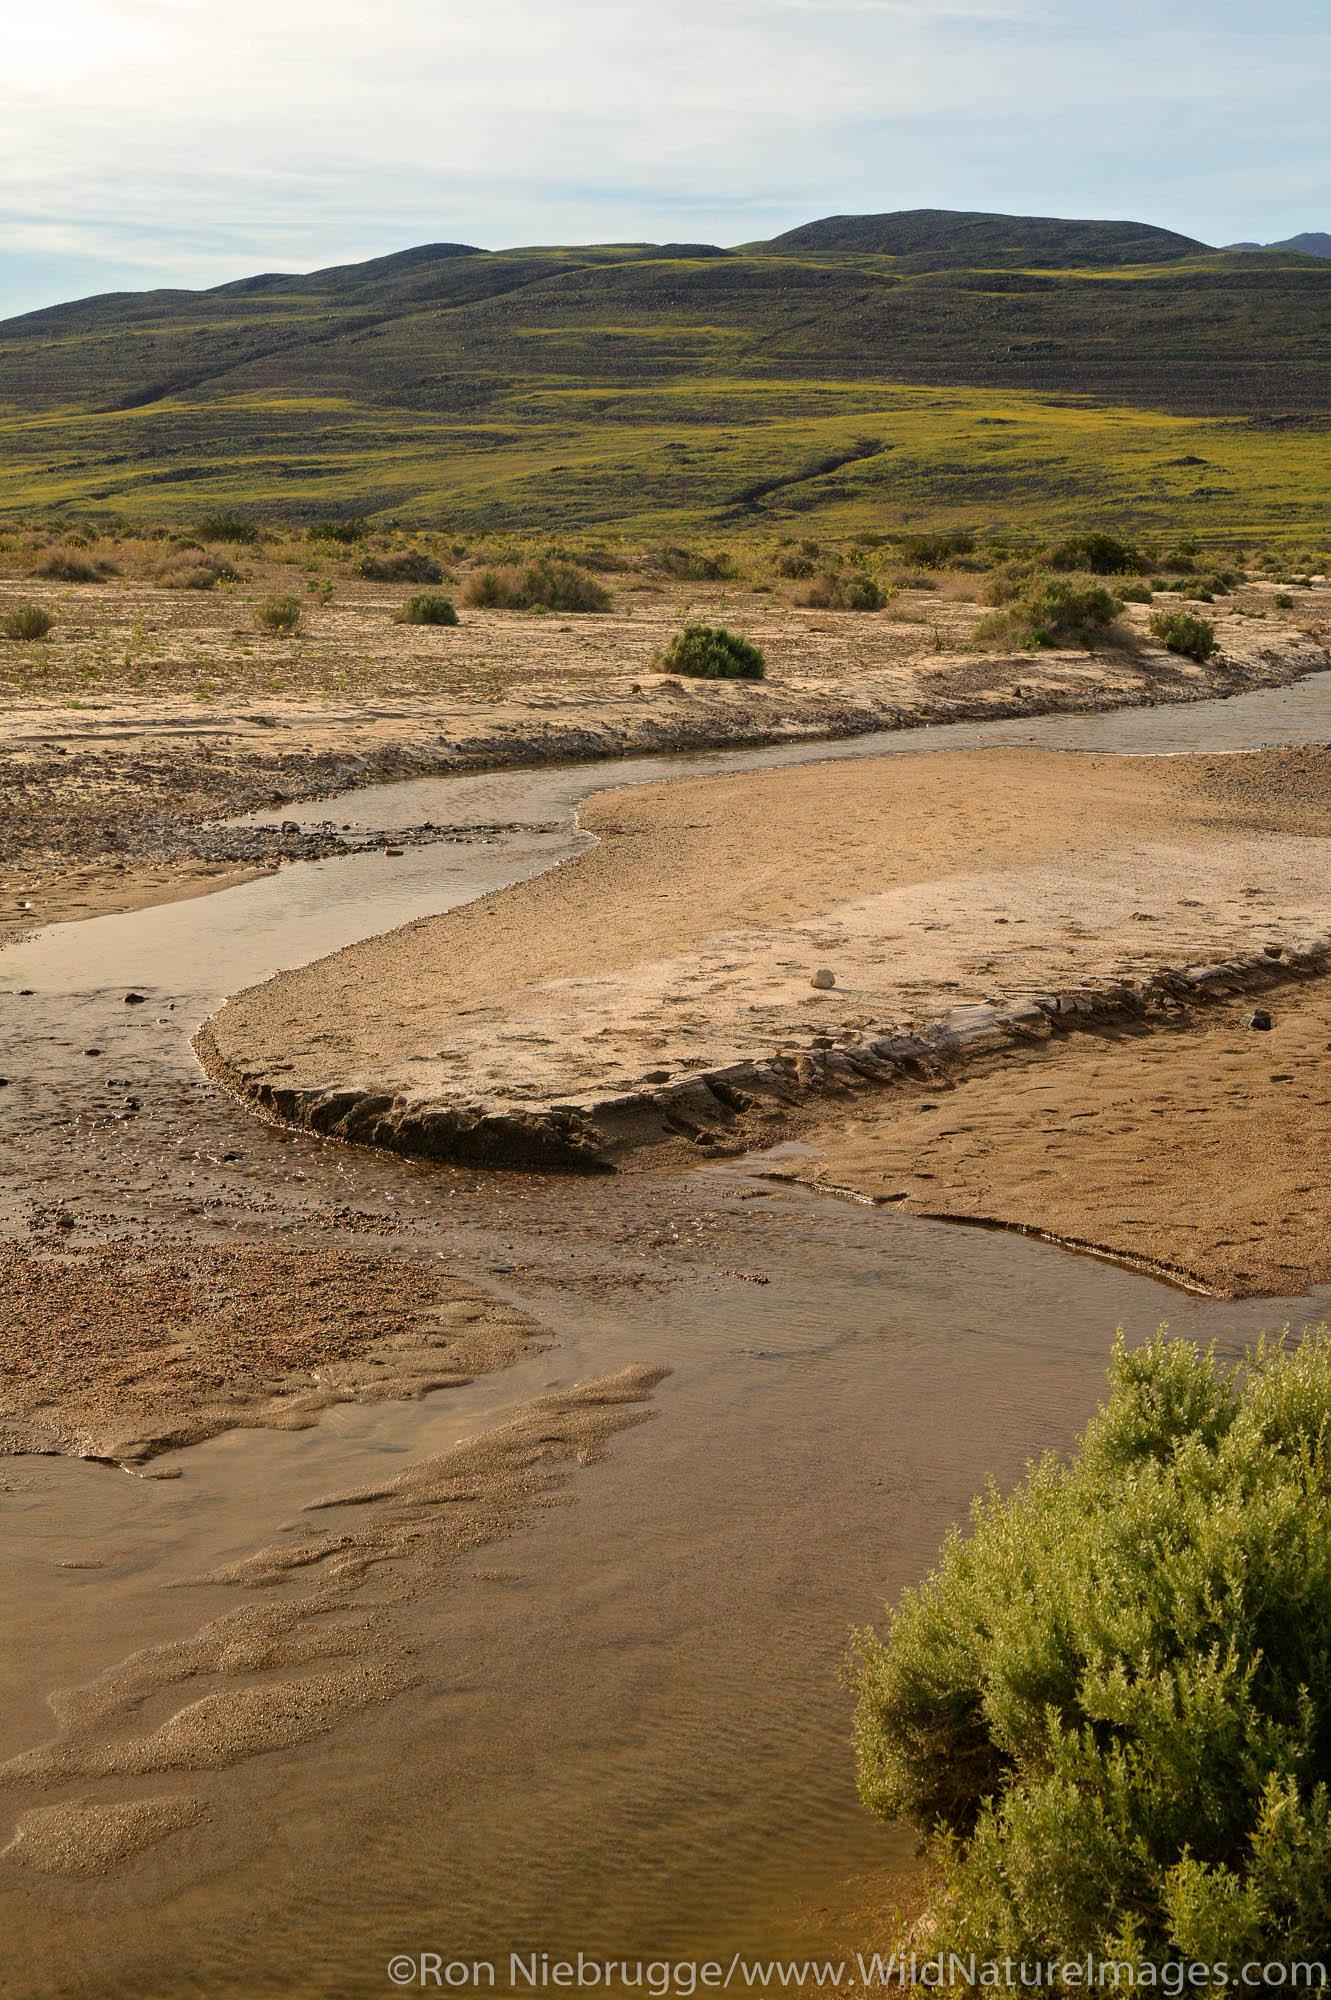 The Amargosa River near the Asford Mill ruins, Death Valley National Park, California.